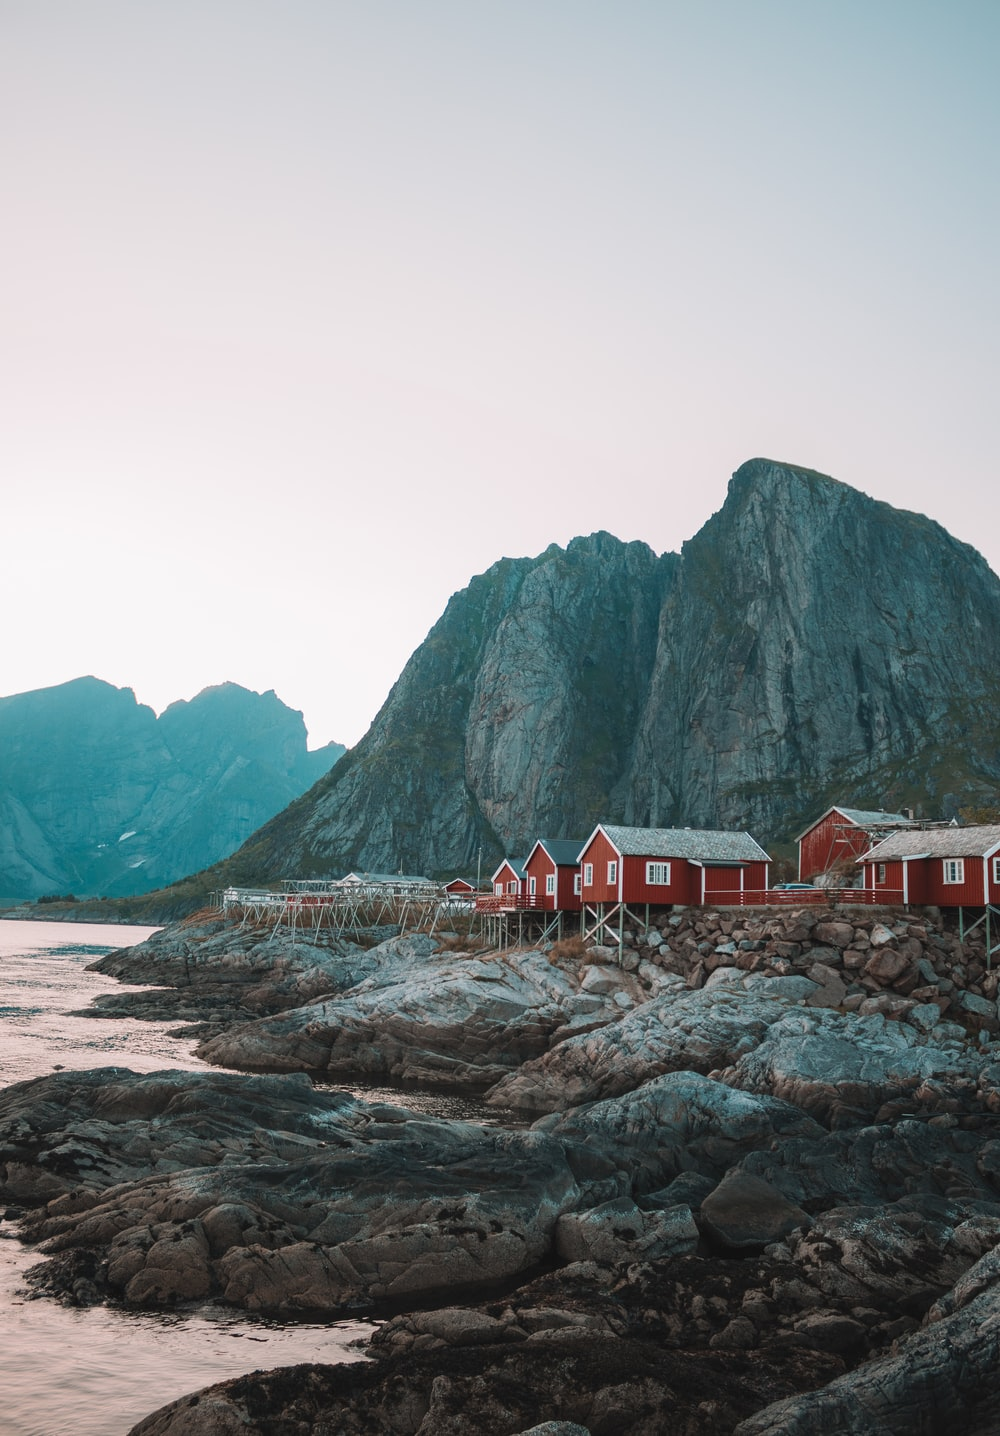 houses beside rock mountain